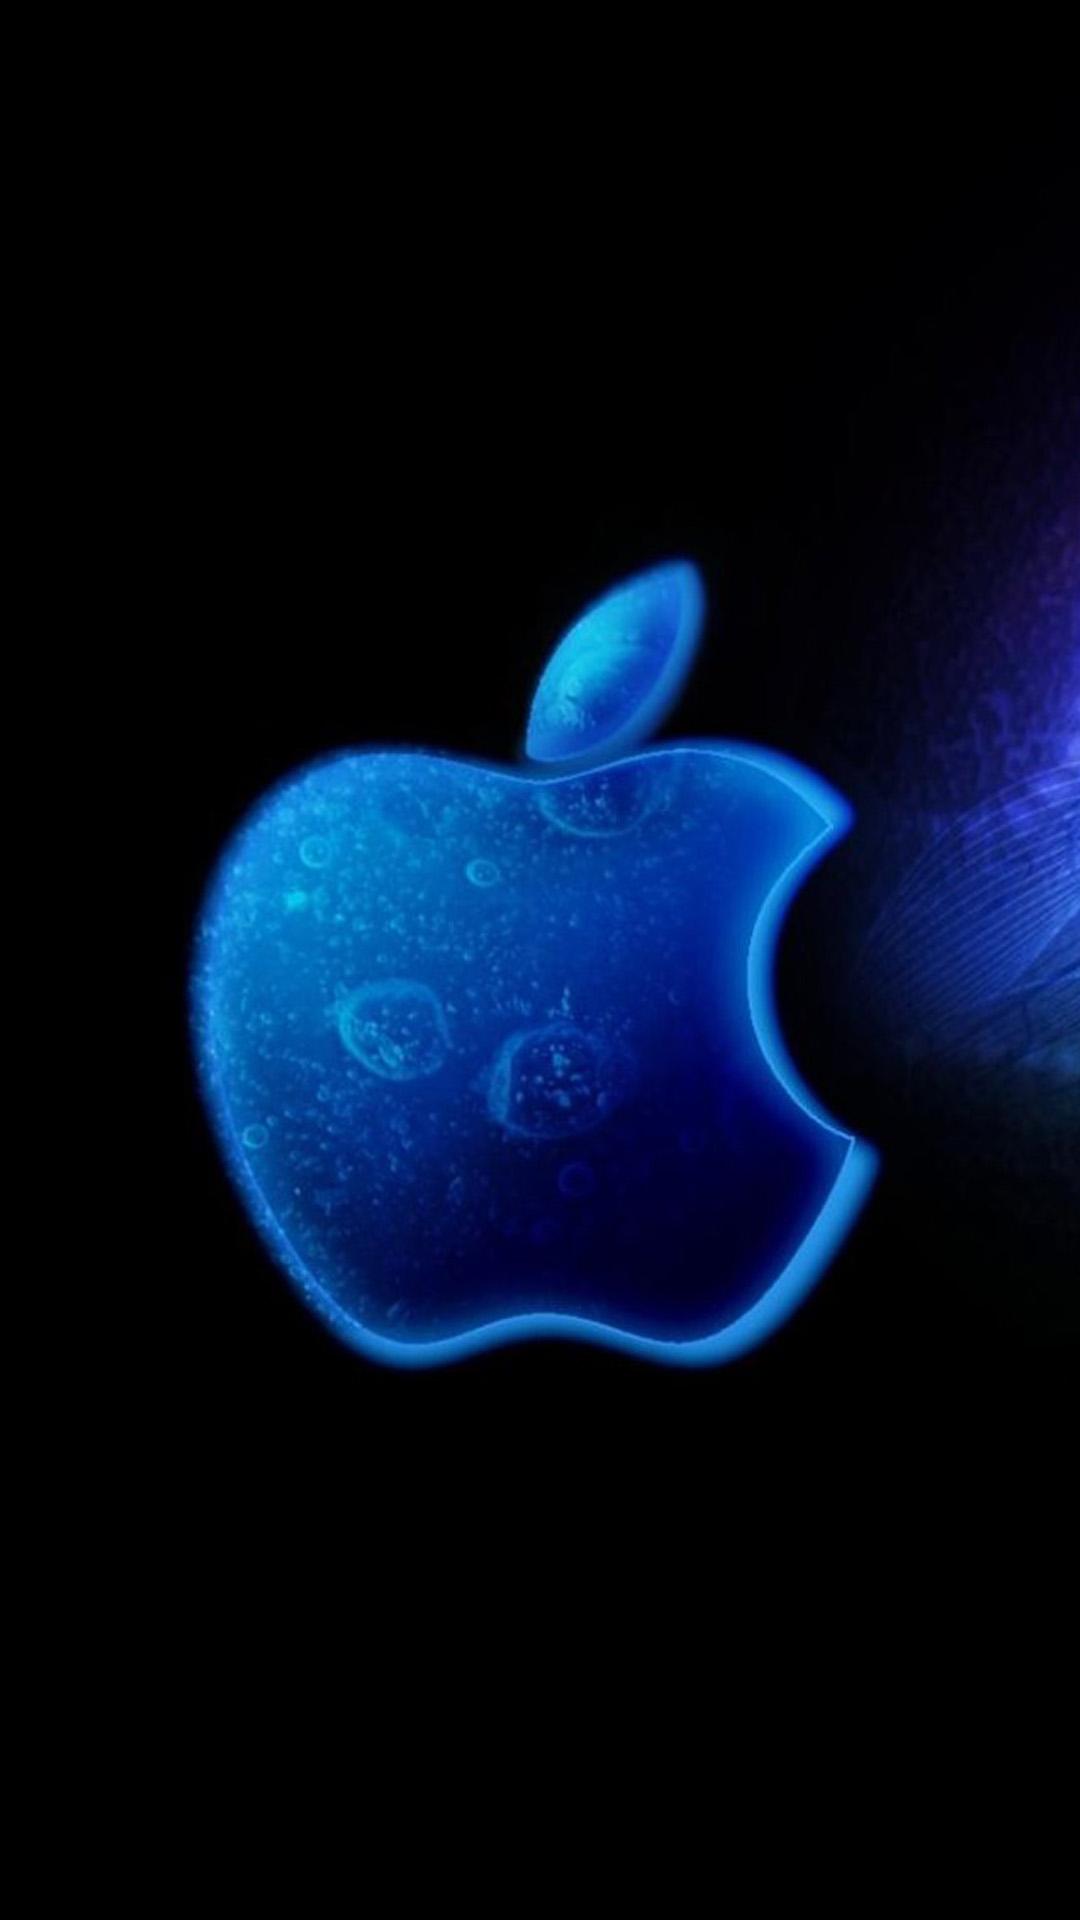 Apple iPhone 6 Plus Wallpaper 270 iPhone 6 Plus Wallpapers HD 1080x1920